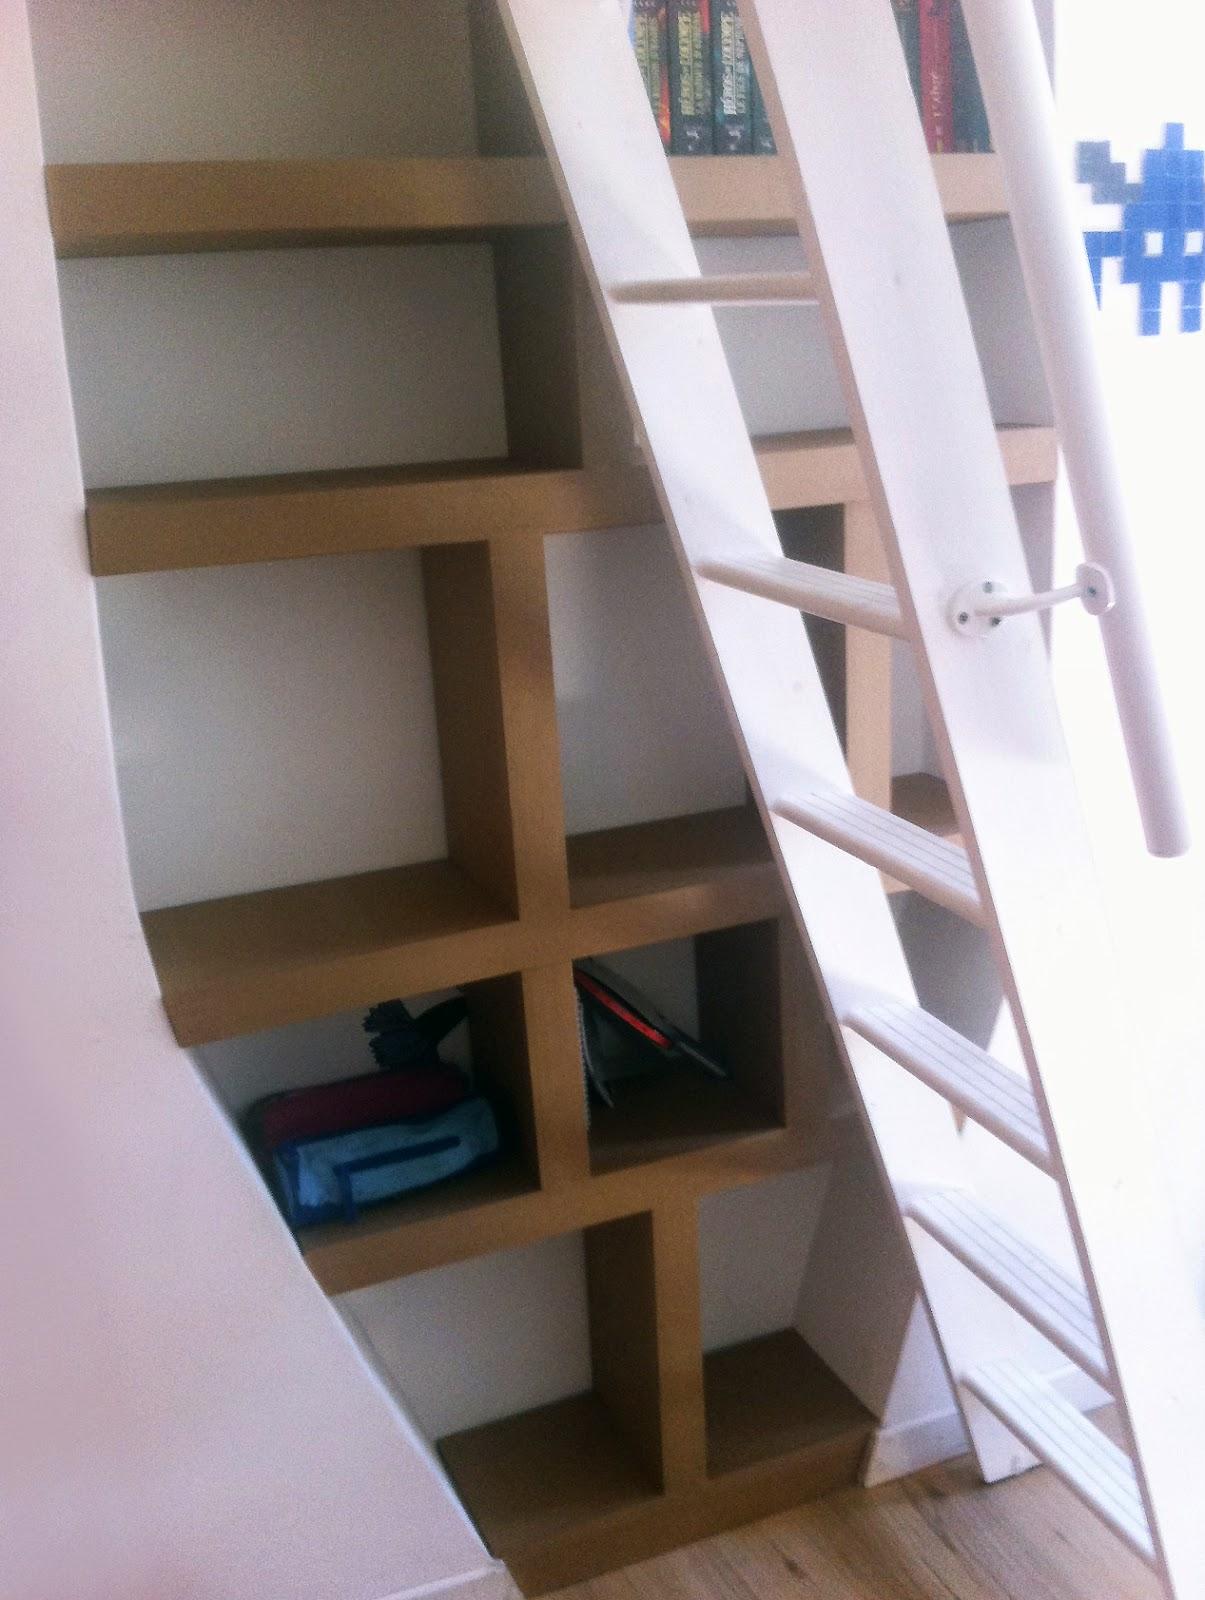 juliadesign tag res rangements. Black Bedroom Furniture Sets. Home Design Ideas